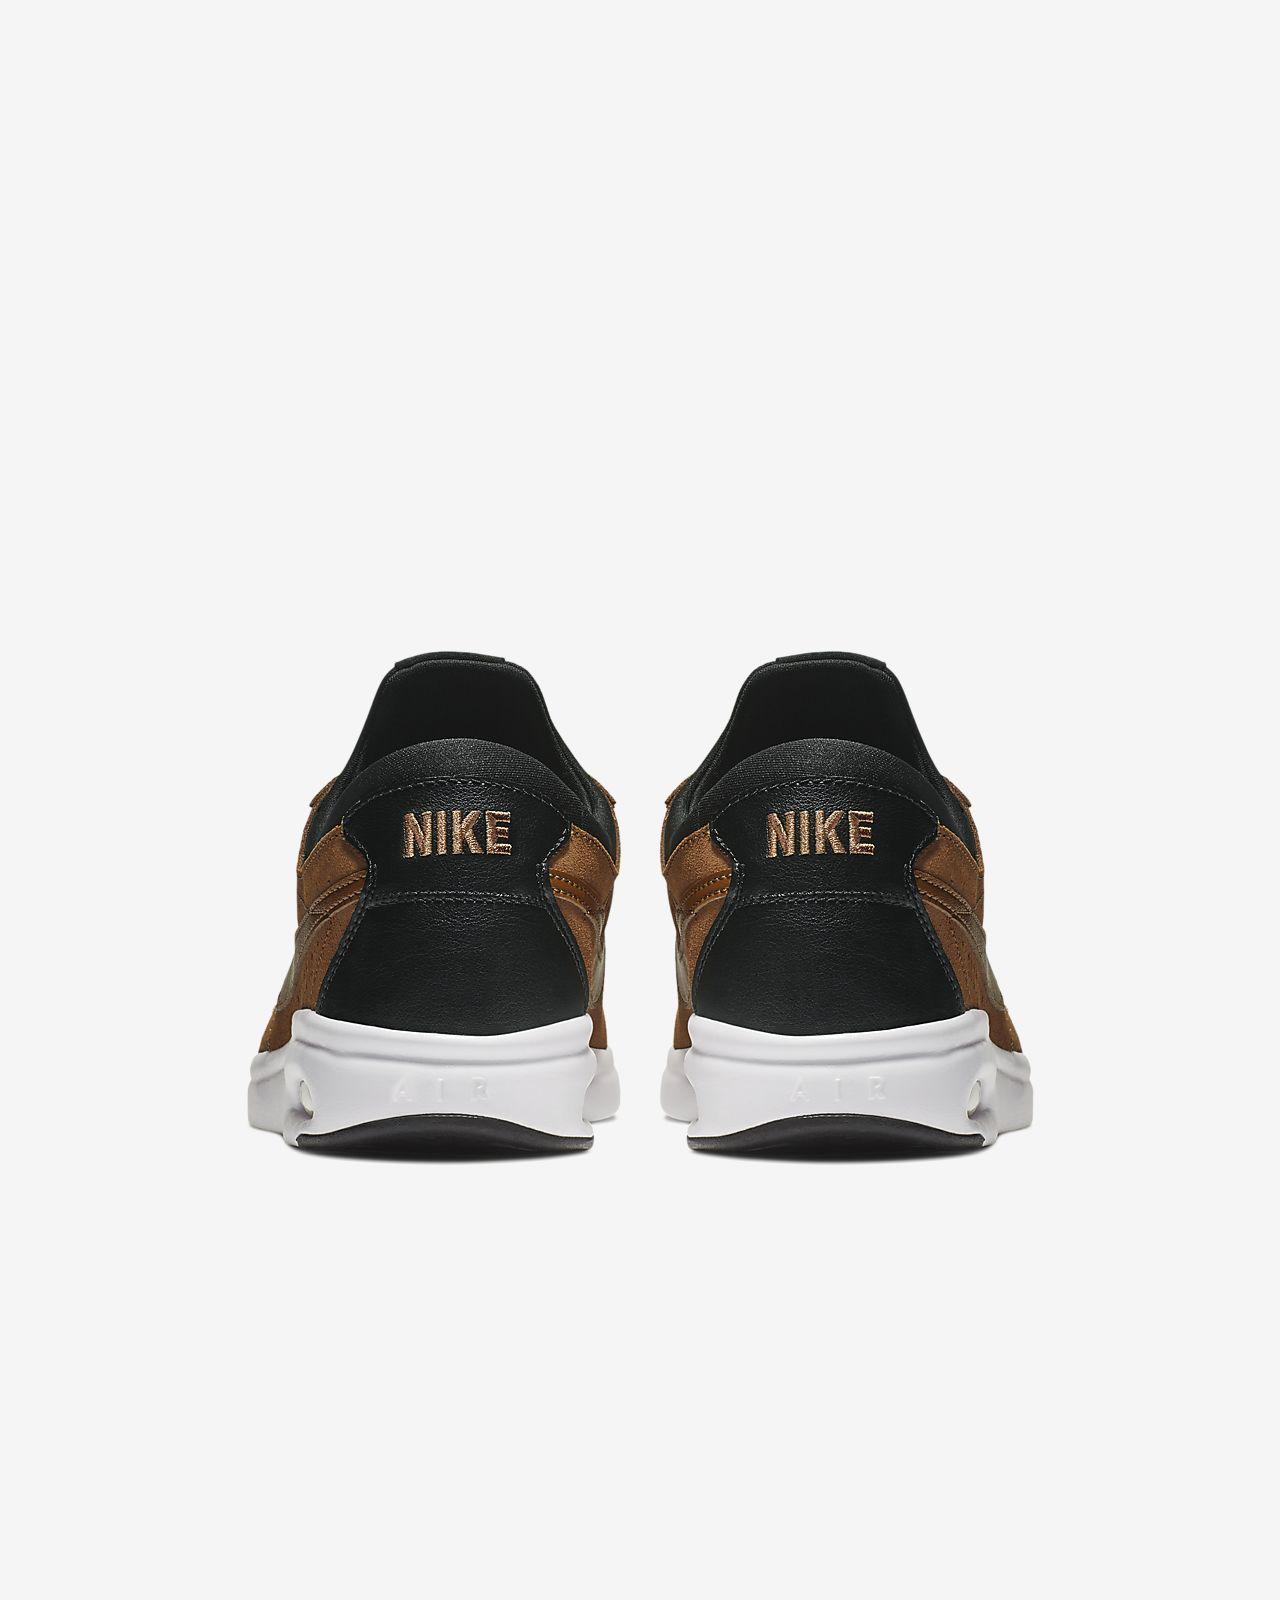 66ed9f9d58ed ... Nike SB Air Max Bruin Vapor Men s Skate Shoe